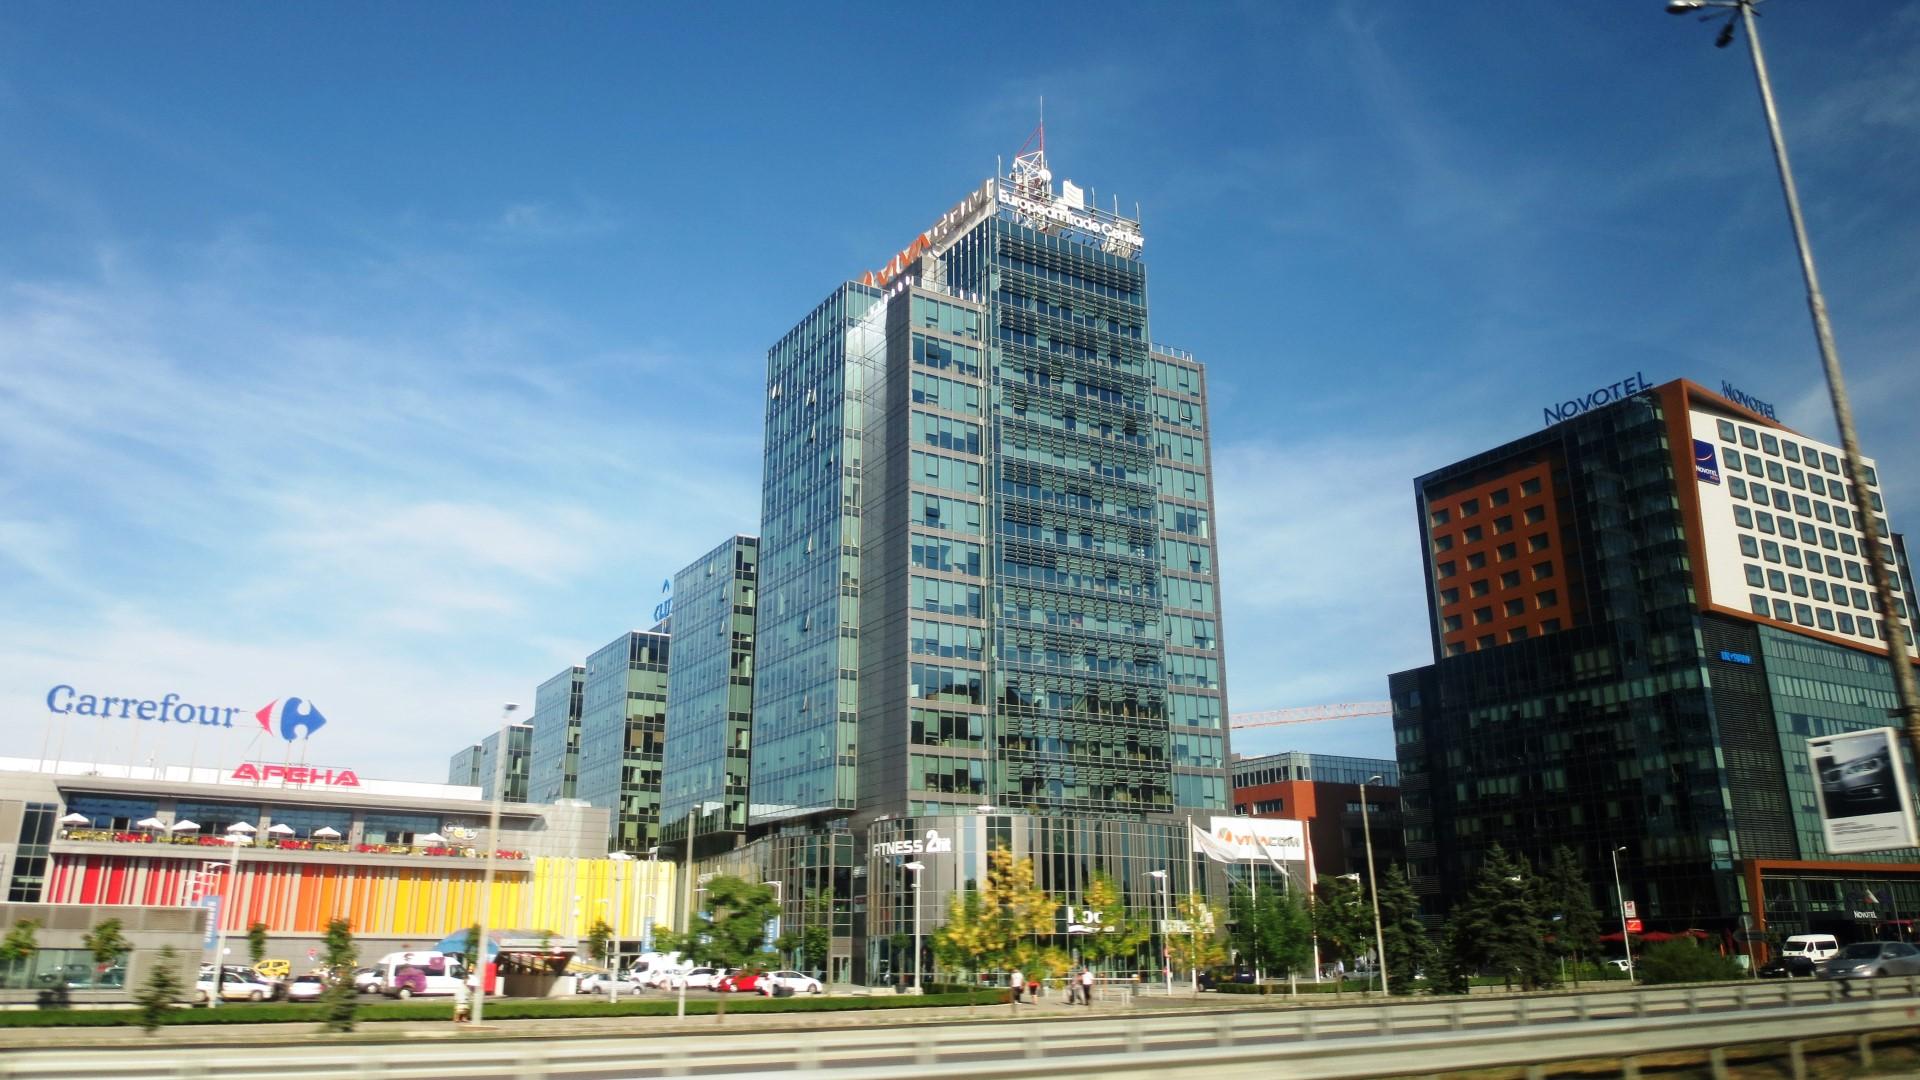 Hotels in Sofia